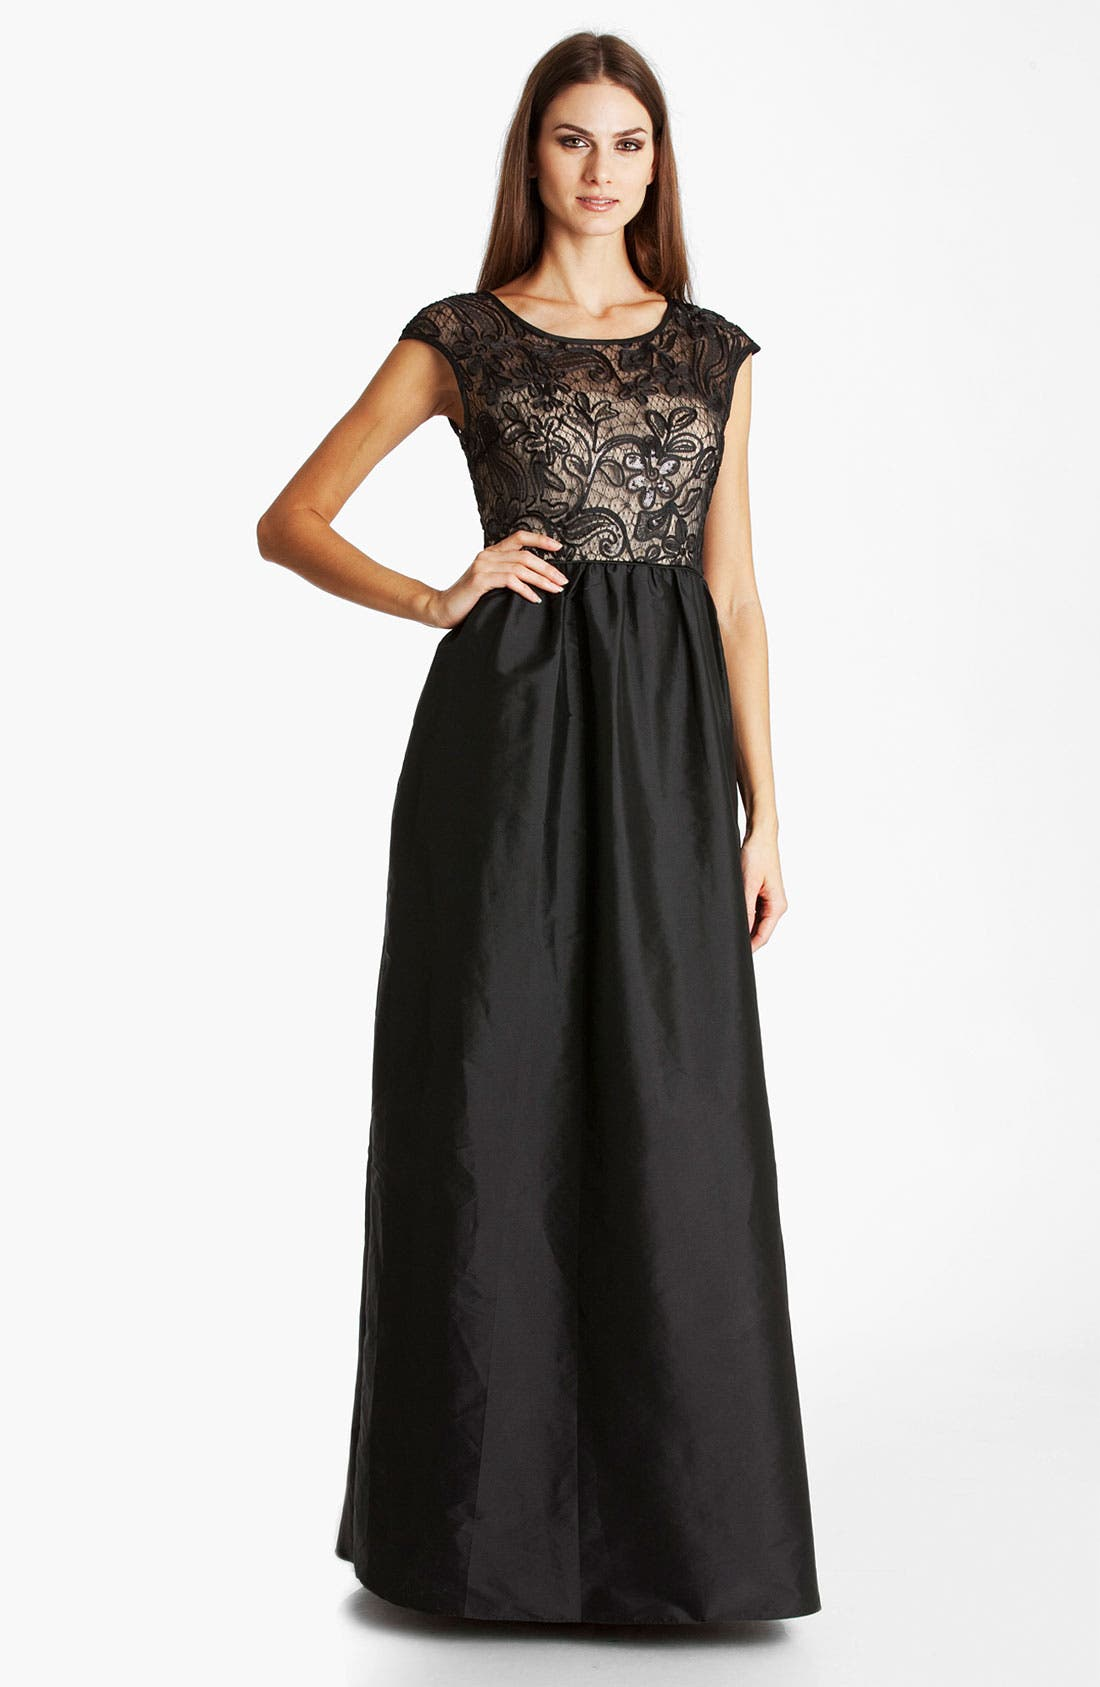 Alternate Image 1 Selected - JS Boutique Lace & Taffeta Ballgown